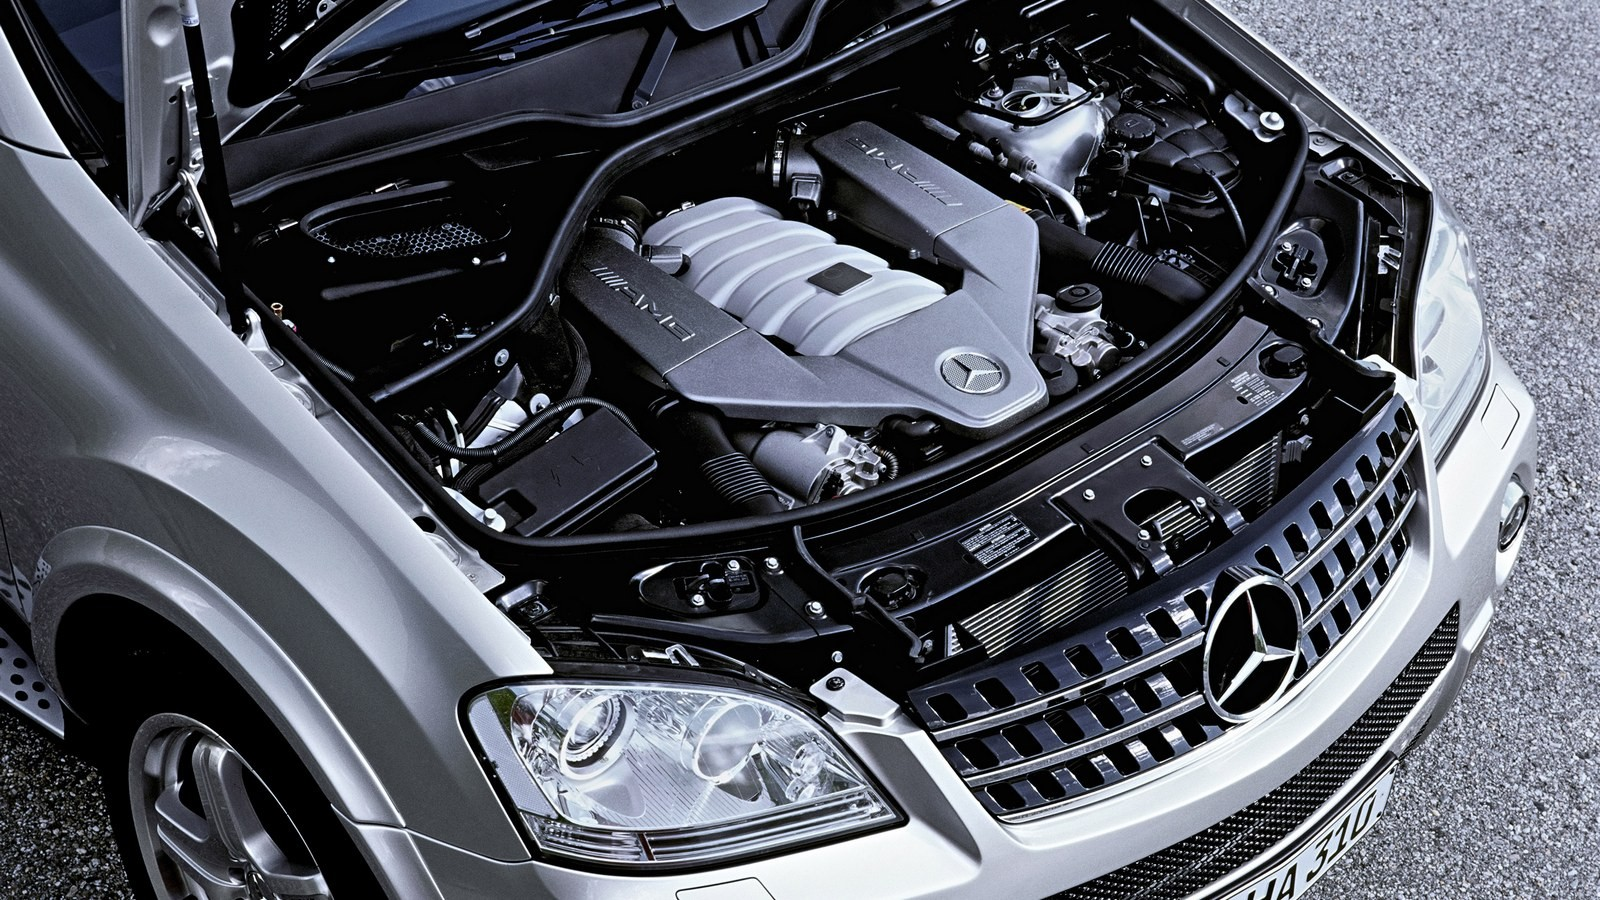 На фото: Под капотом Mercedes-Benz ML 63 AMG (W164) '2006–08 М156